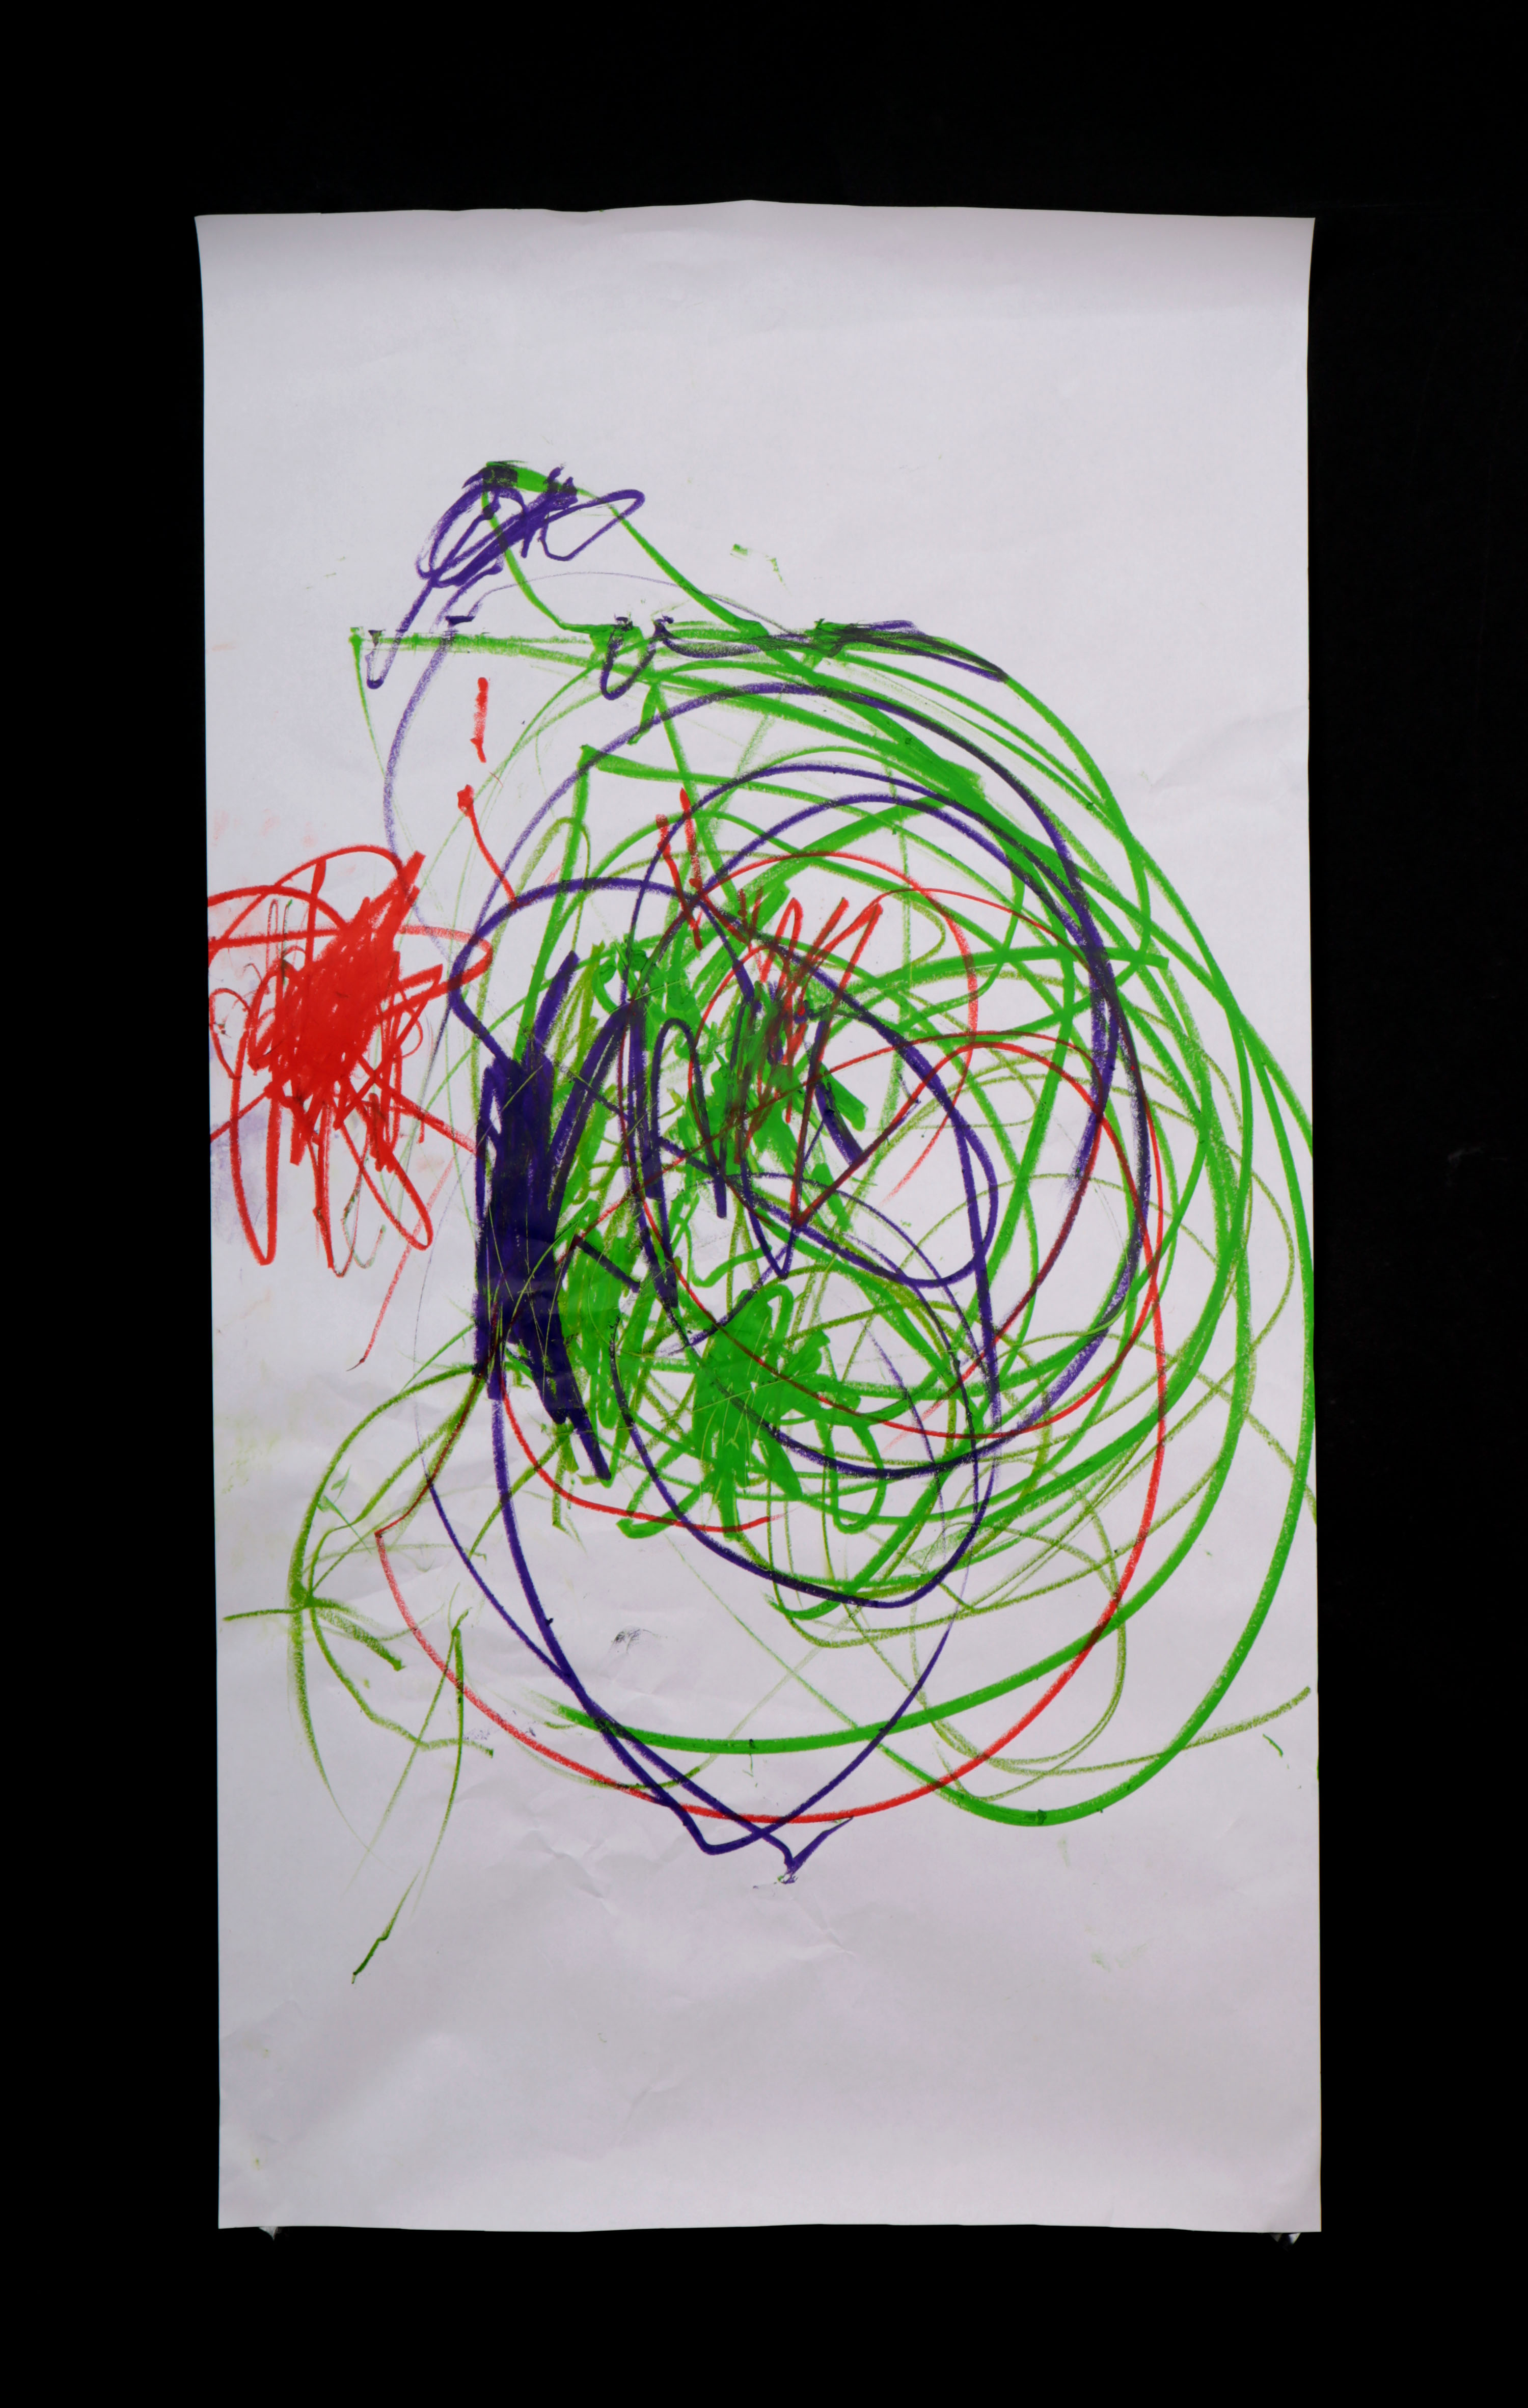 Art by Anastasia. Untitled #72. Gel sticks on paper.